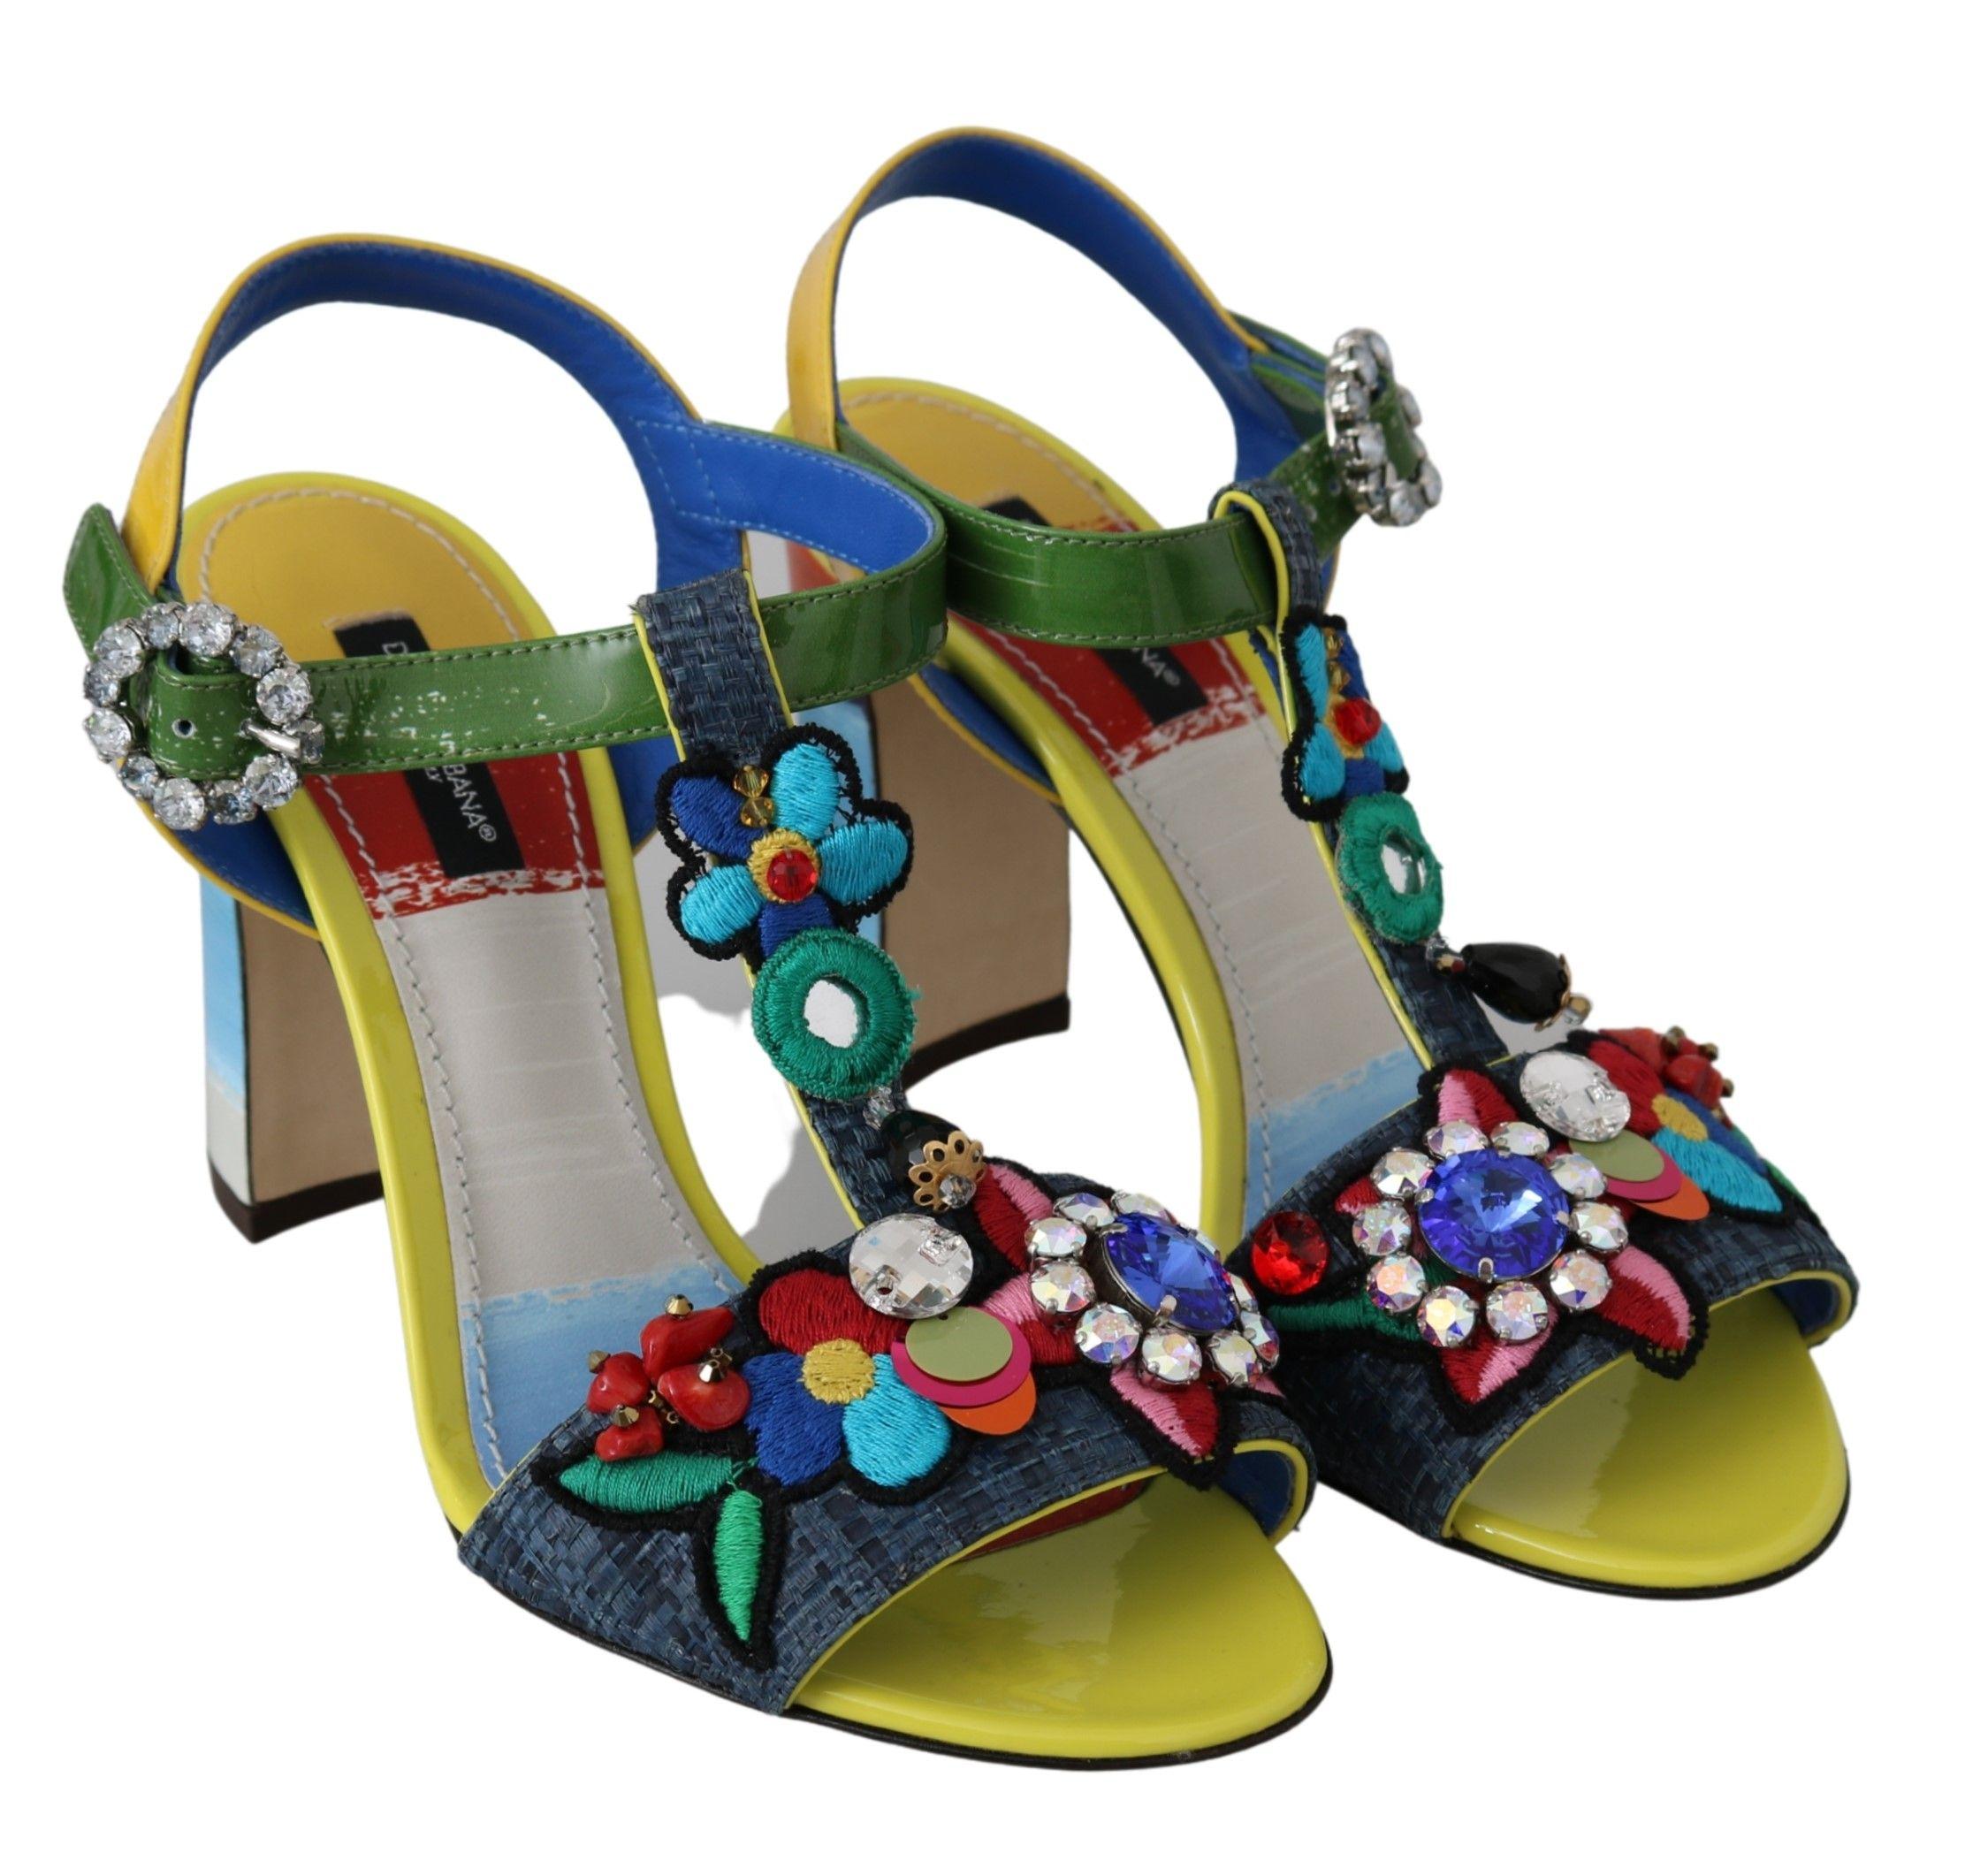 Dolce & Gabbana Black Leather Derby Brogue Dress Shoes